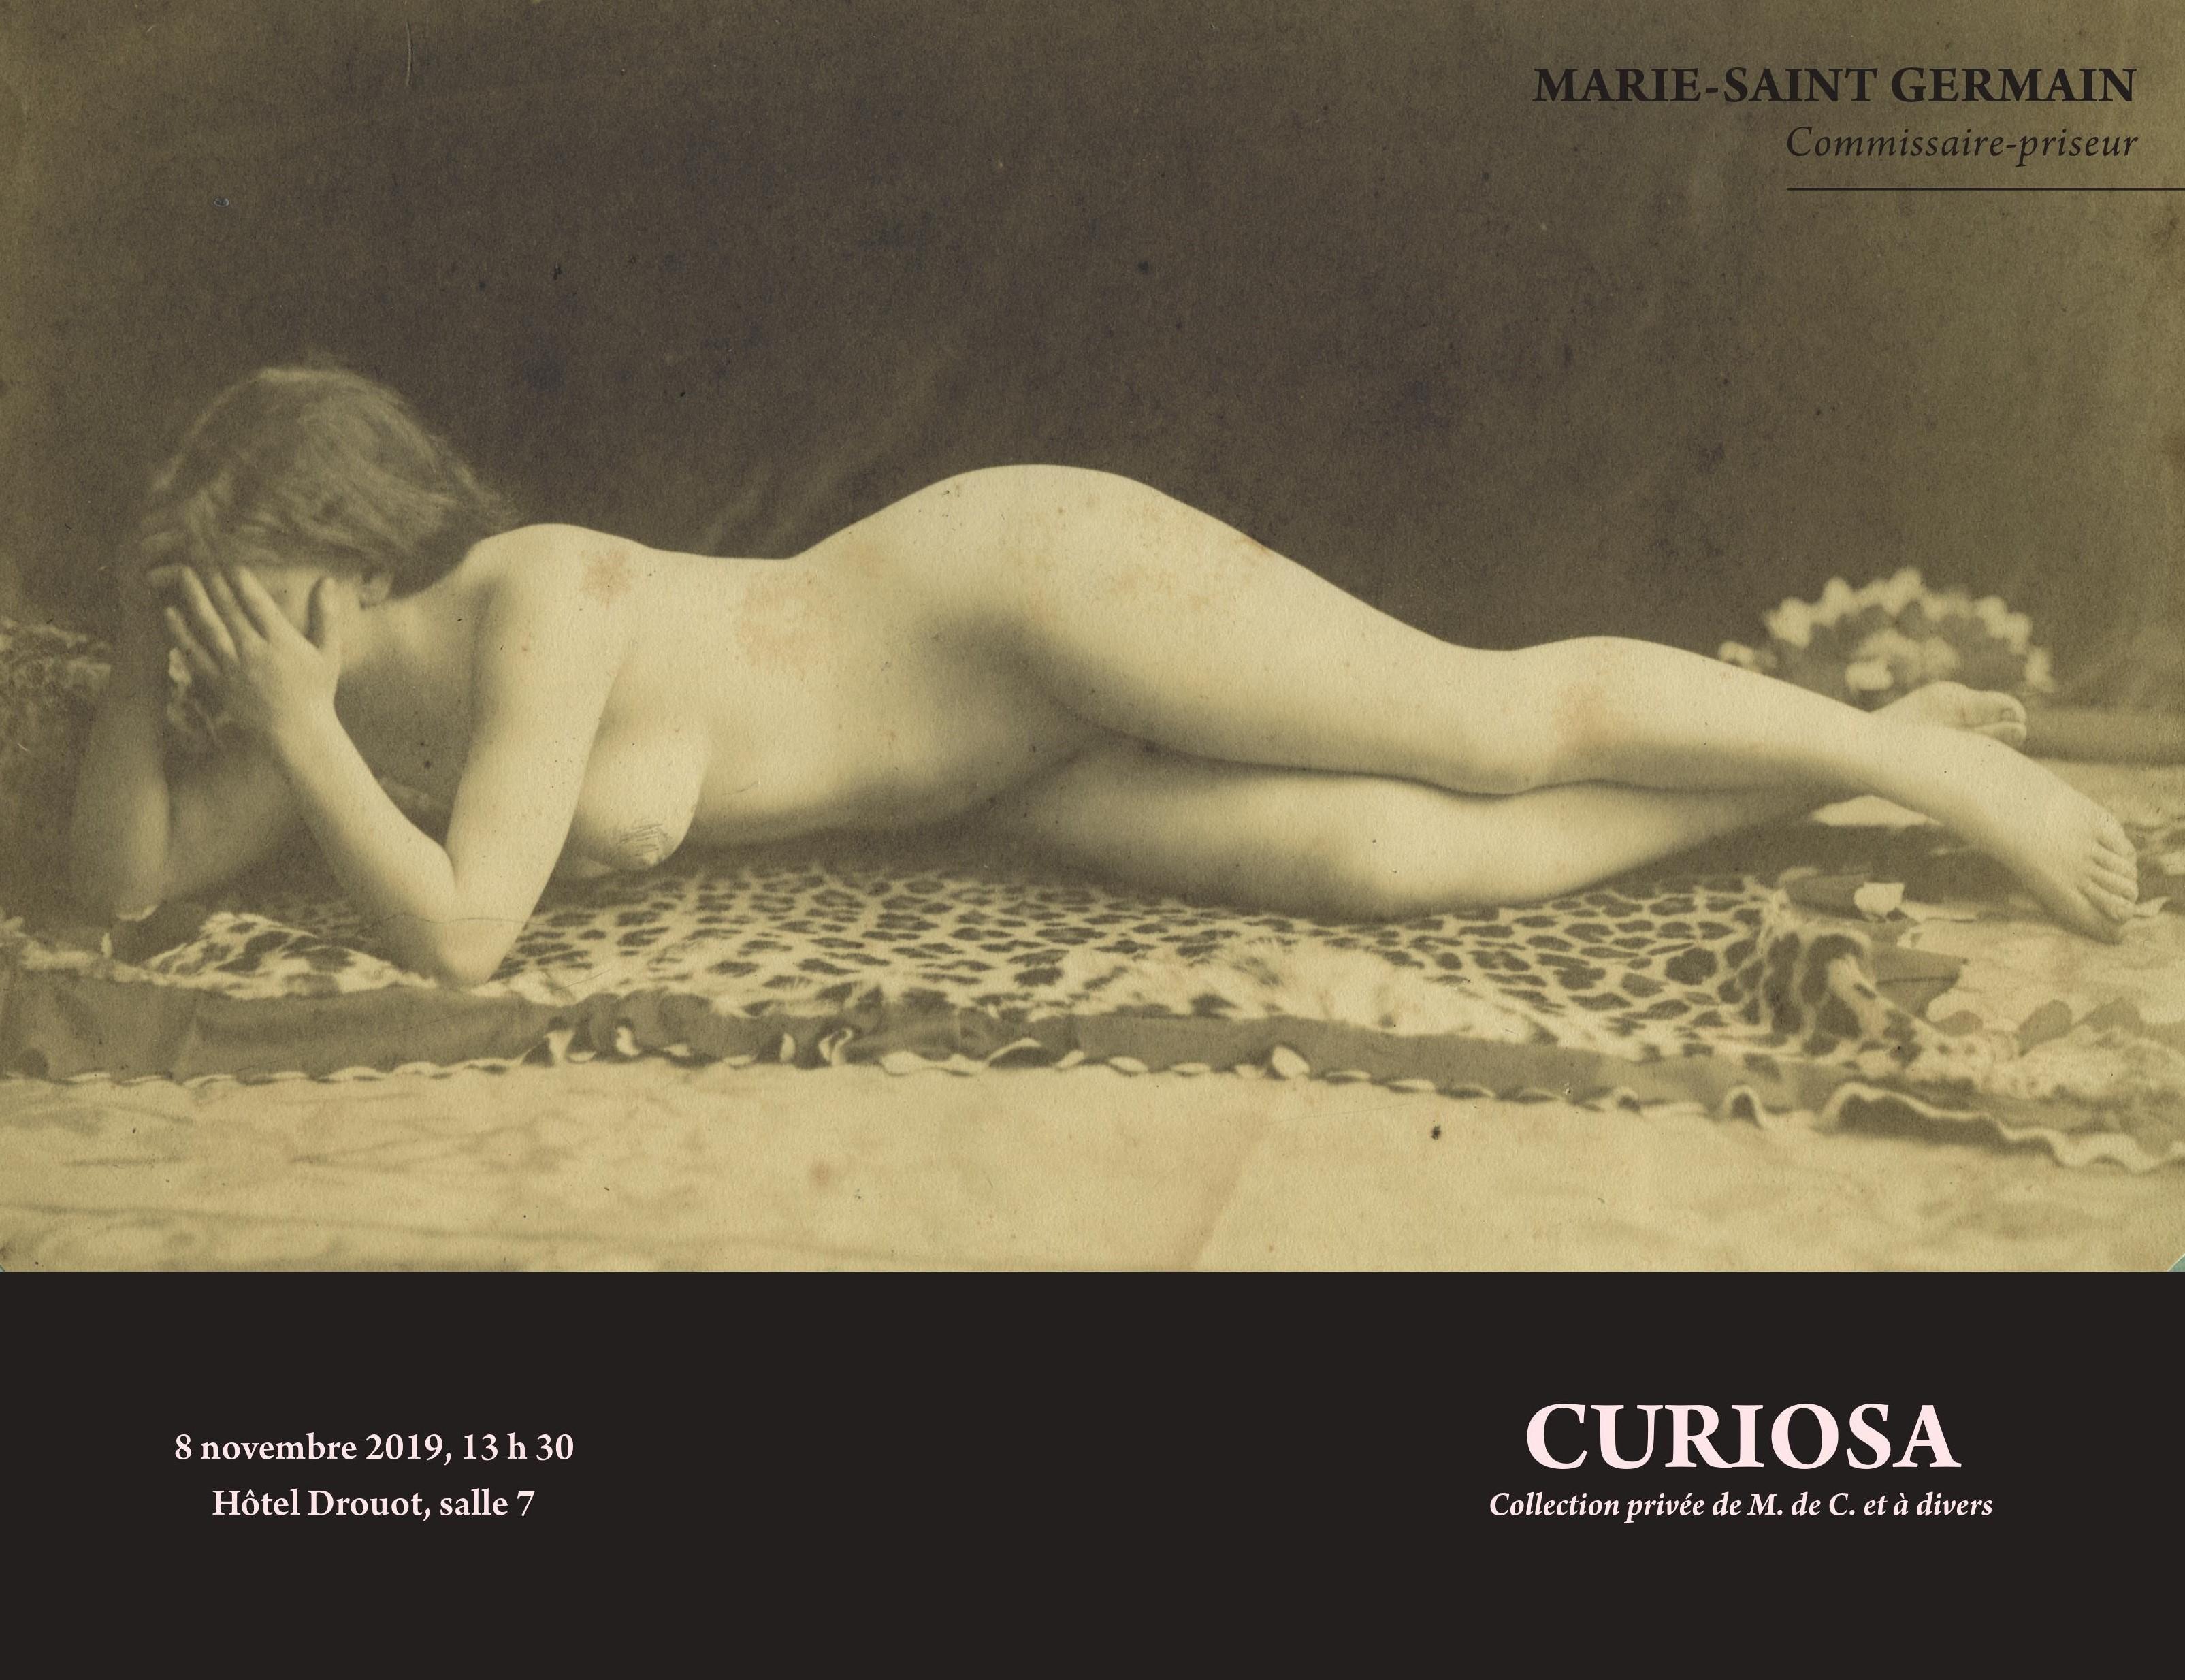 Vente Curiosa chez MARIE-SAINT GERMAIN : 421 lots